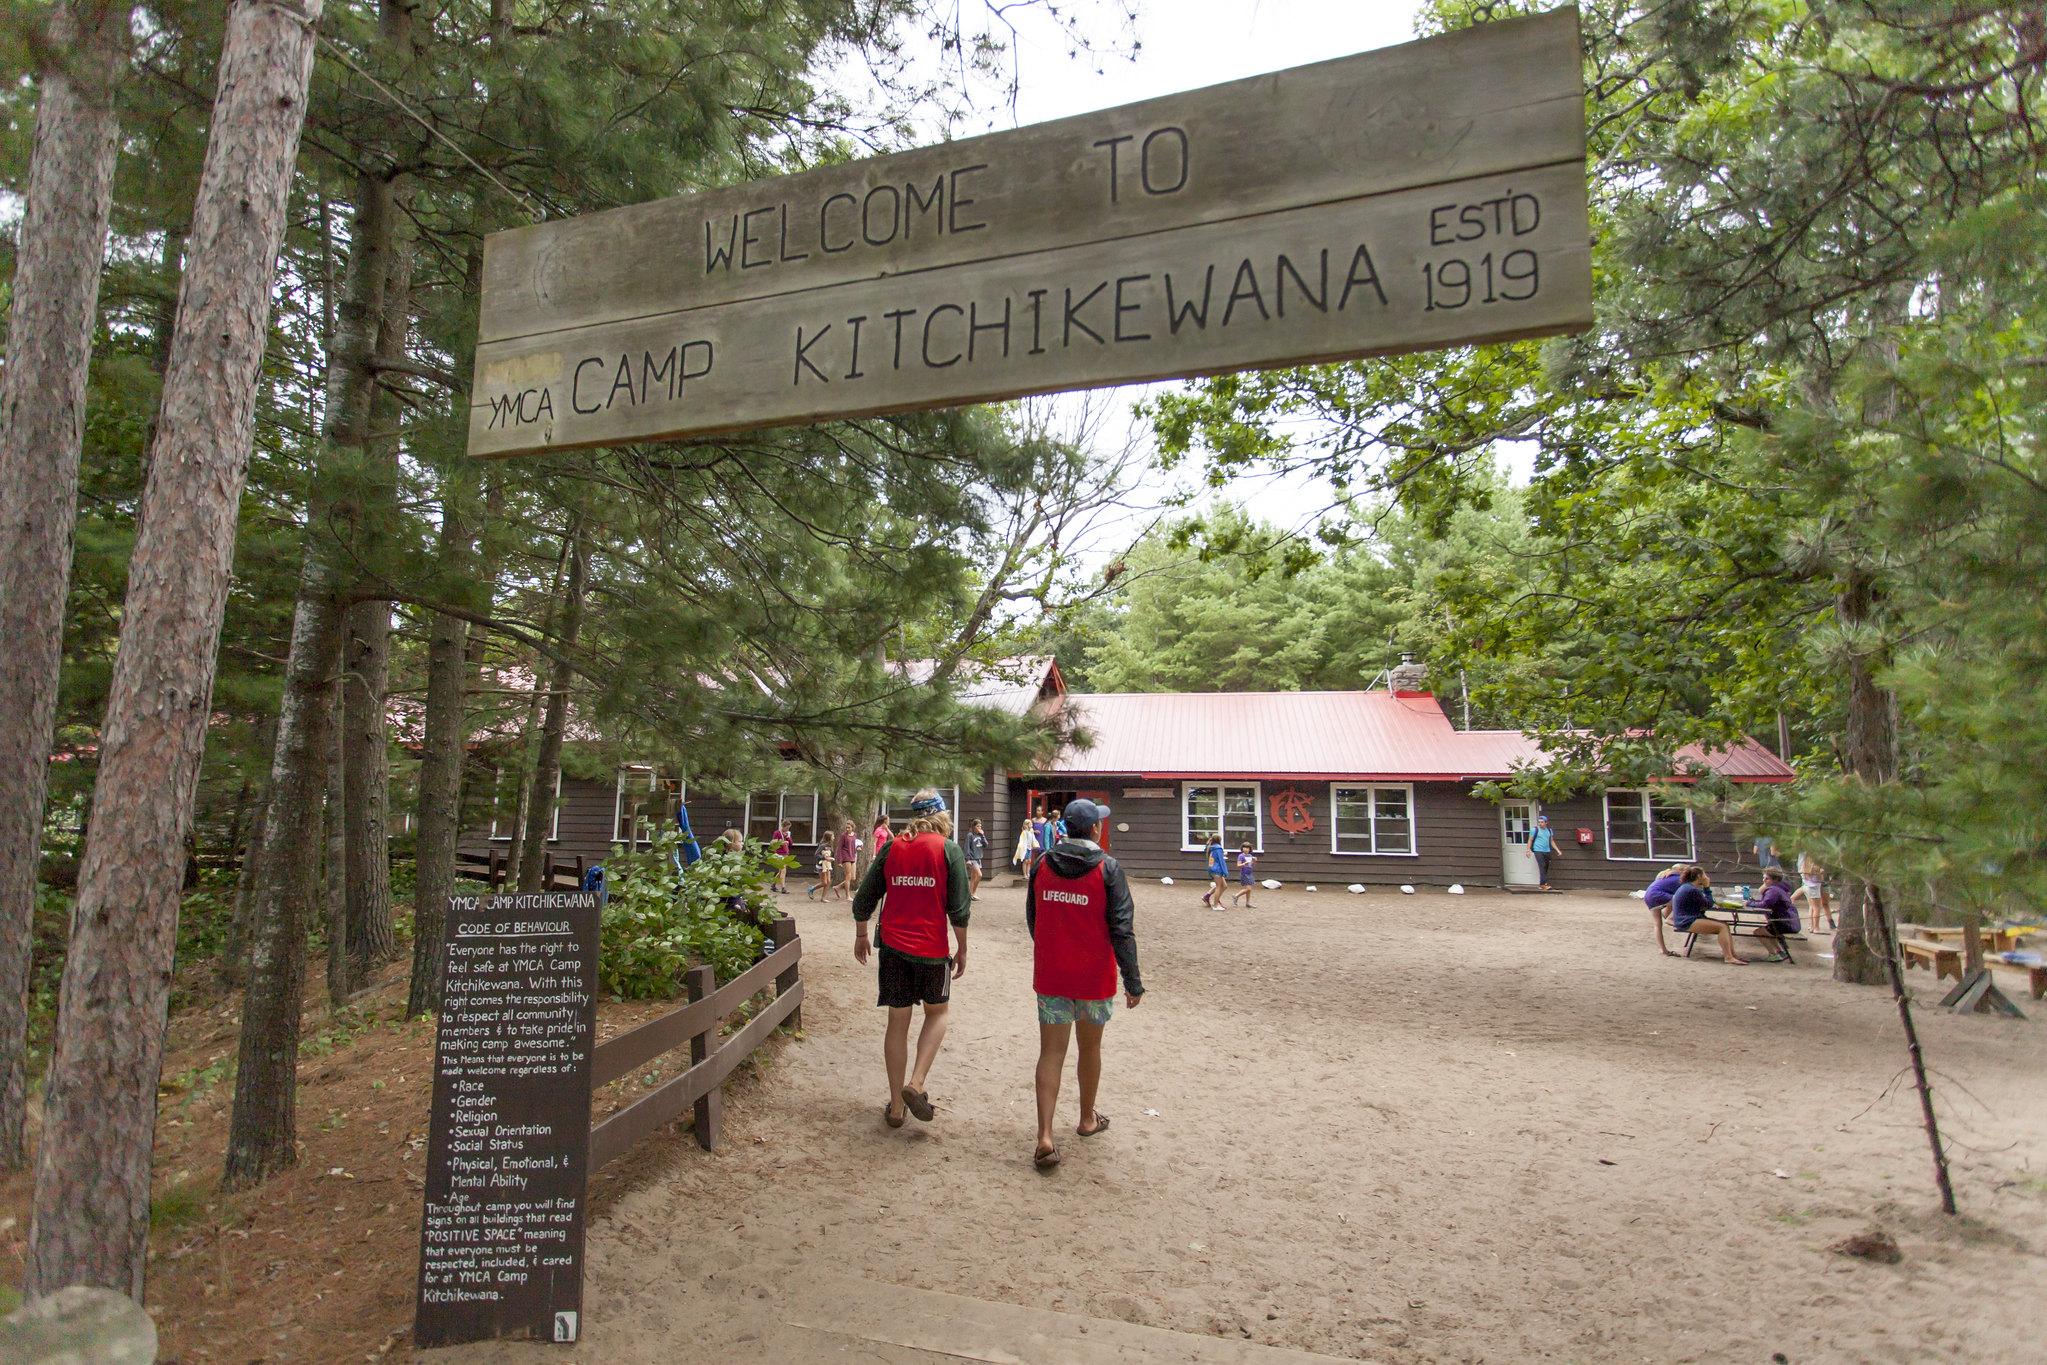 Celebrating 100 Years At YMCA Camp Kitchikewana